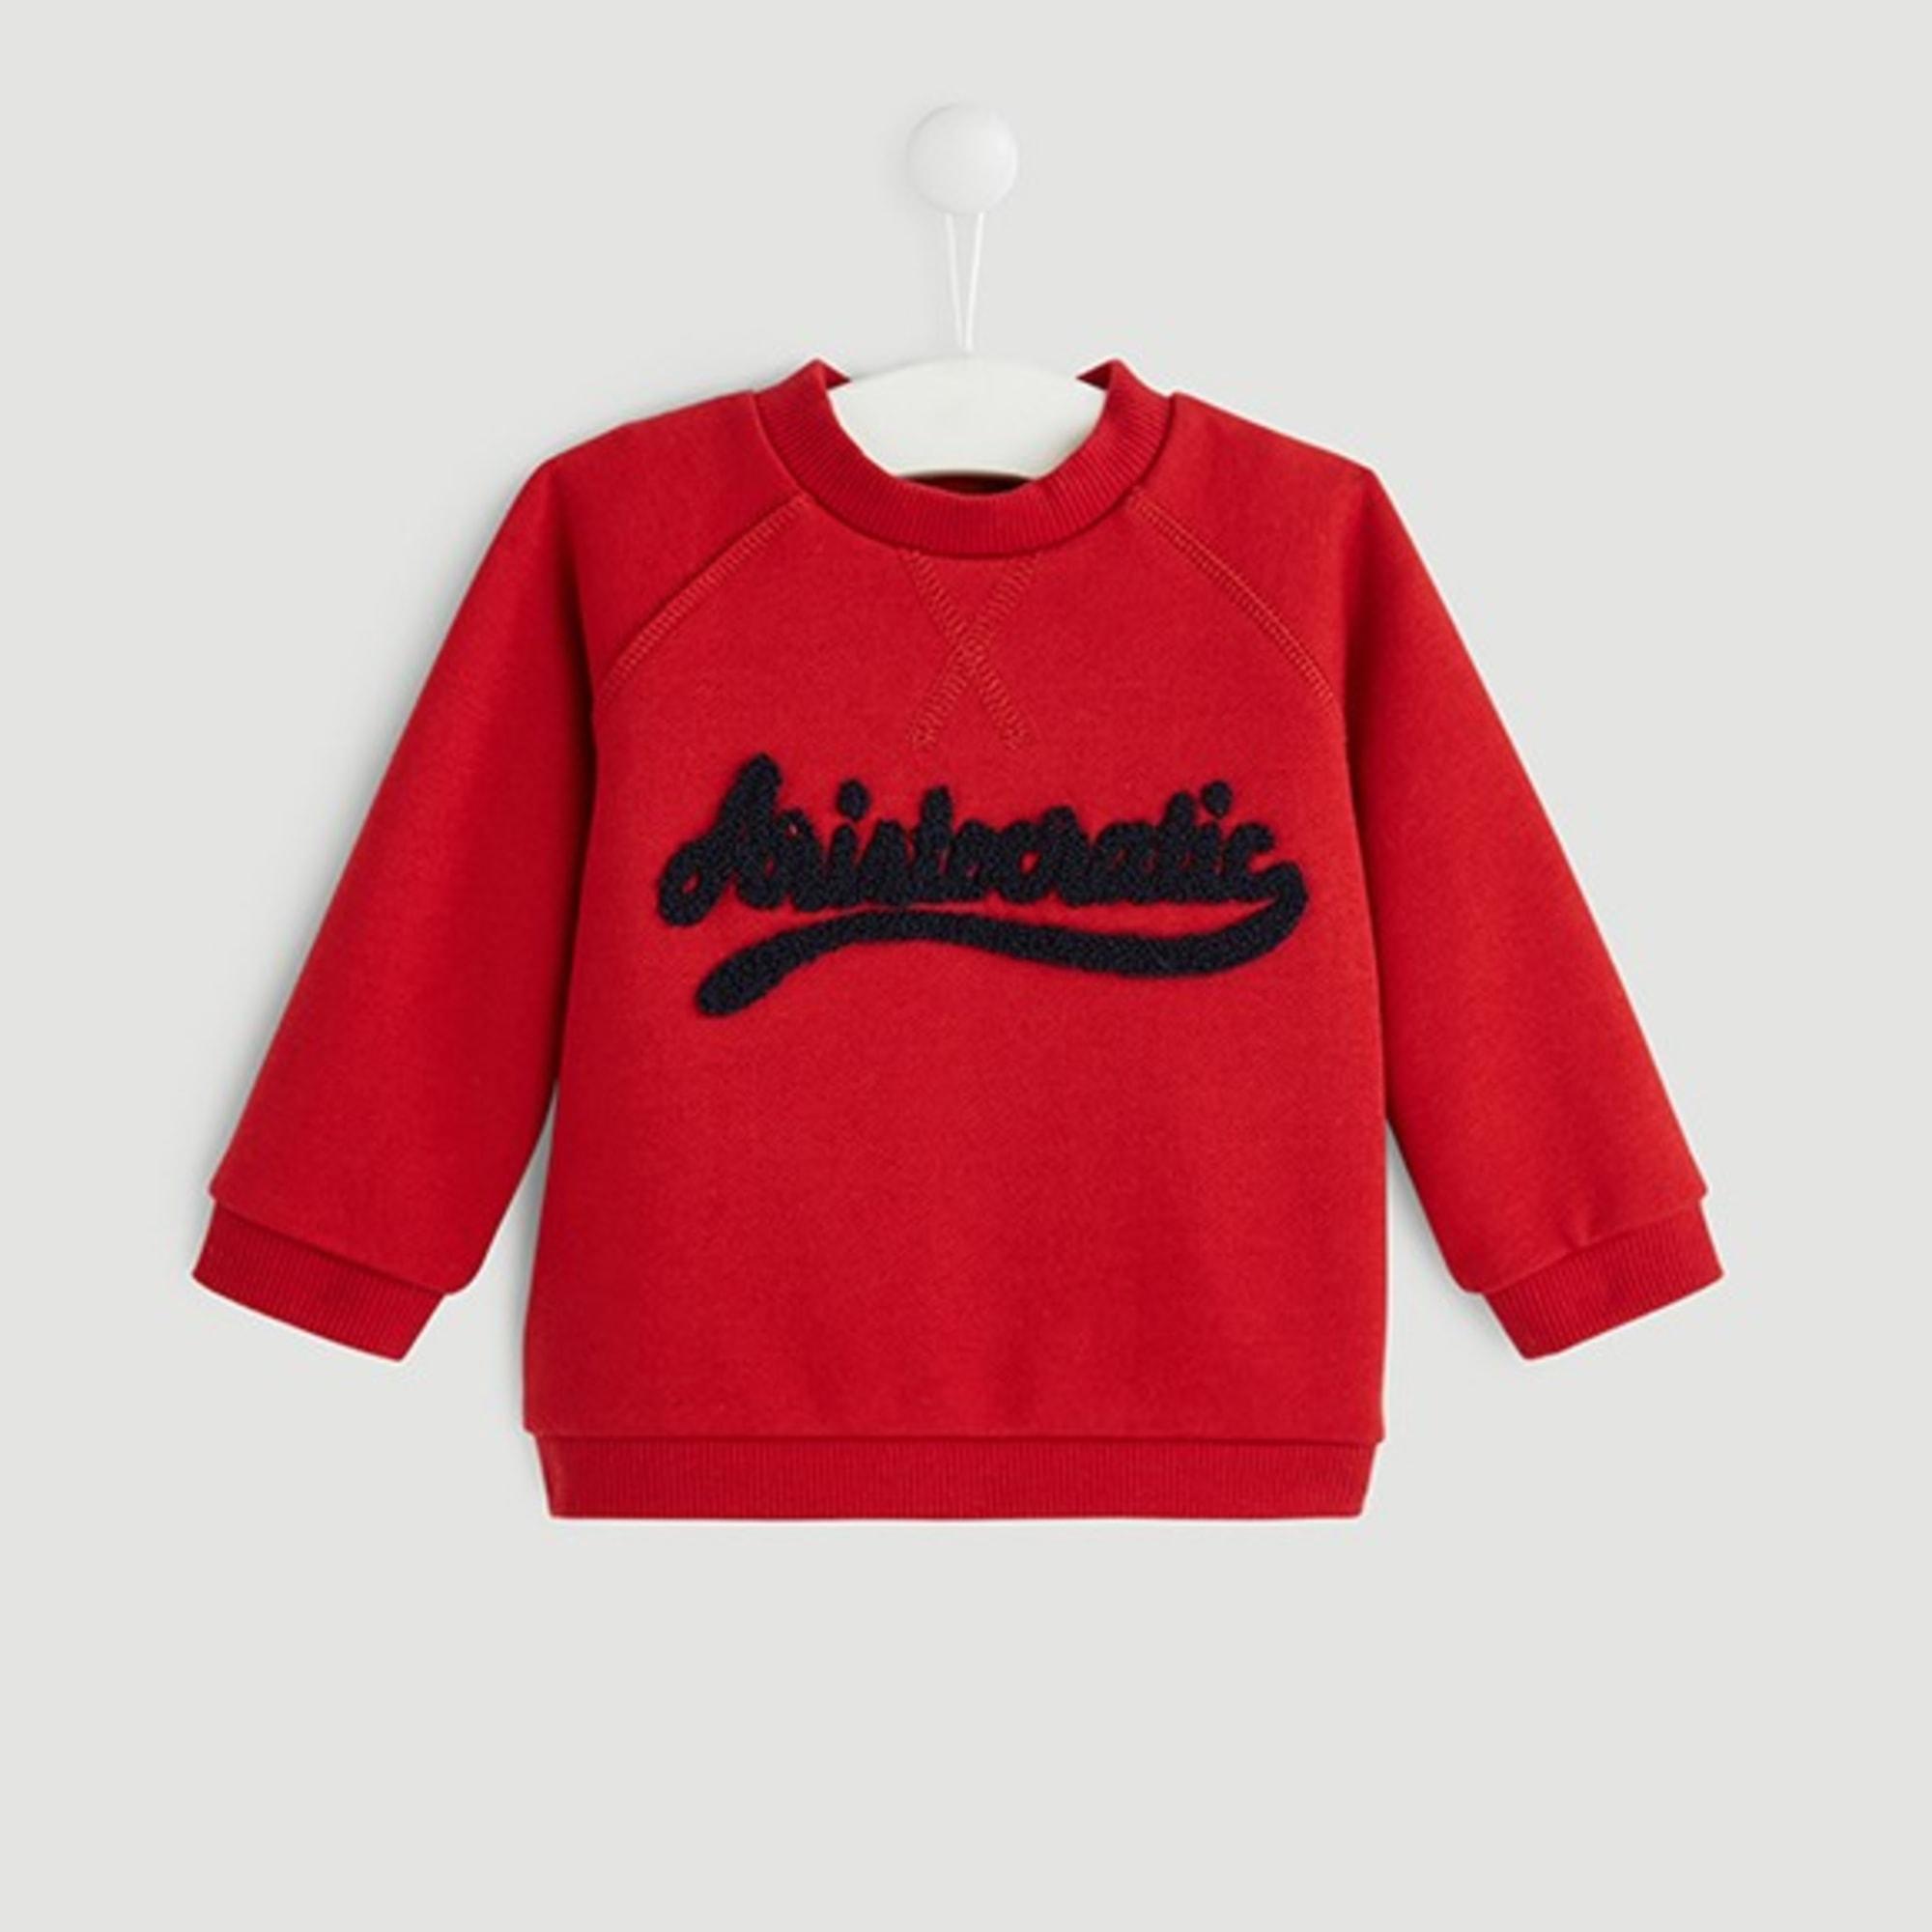 Sweatshirt BOUT'CHOU Red, burgundy